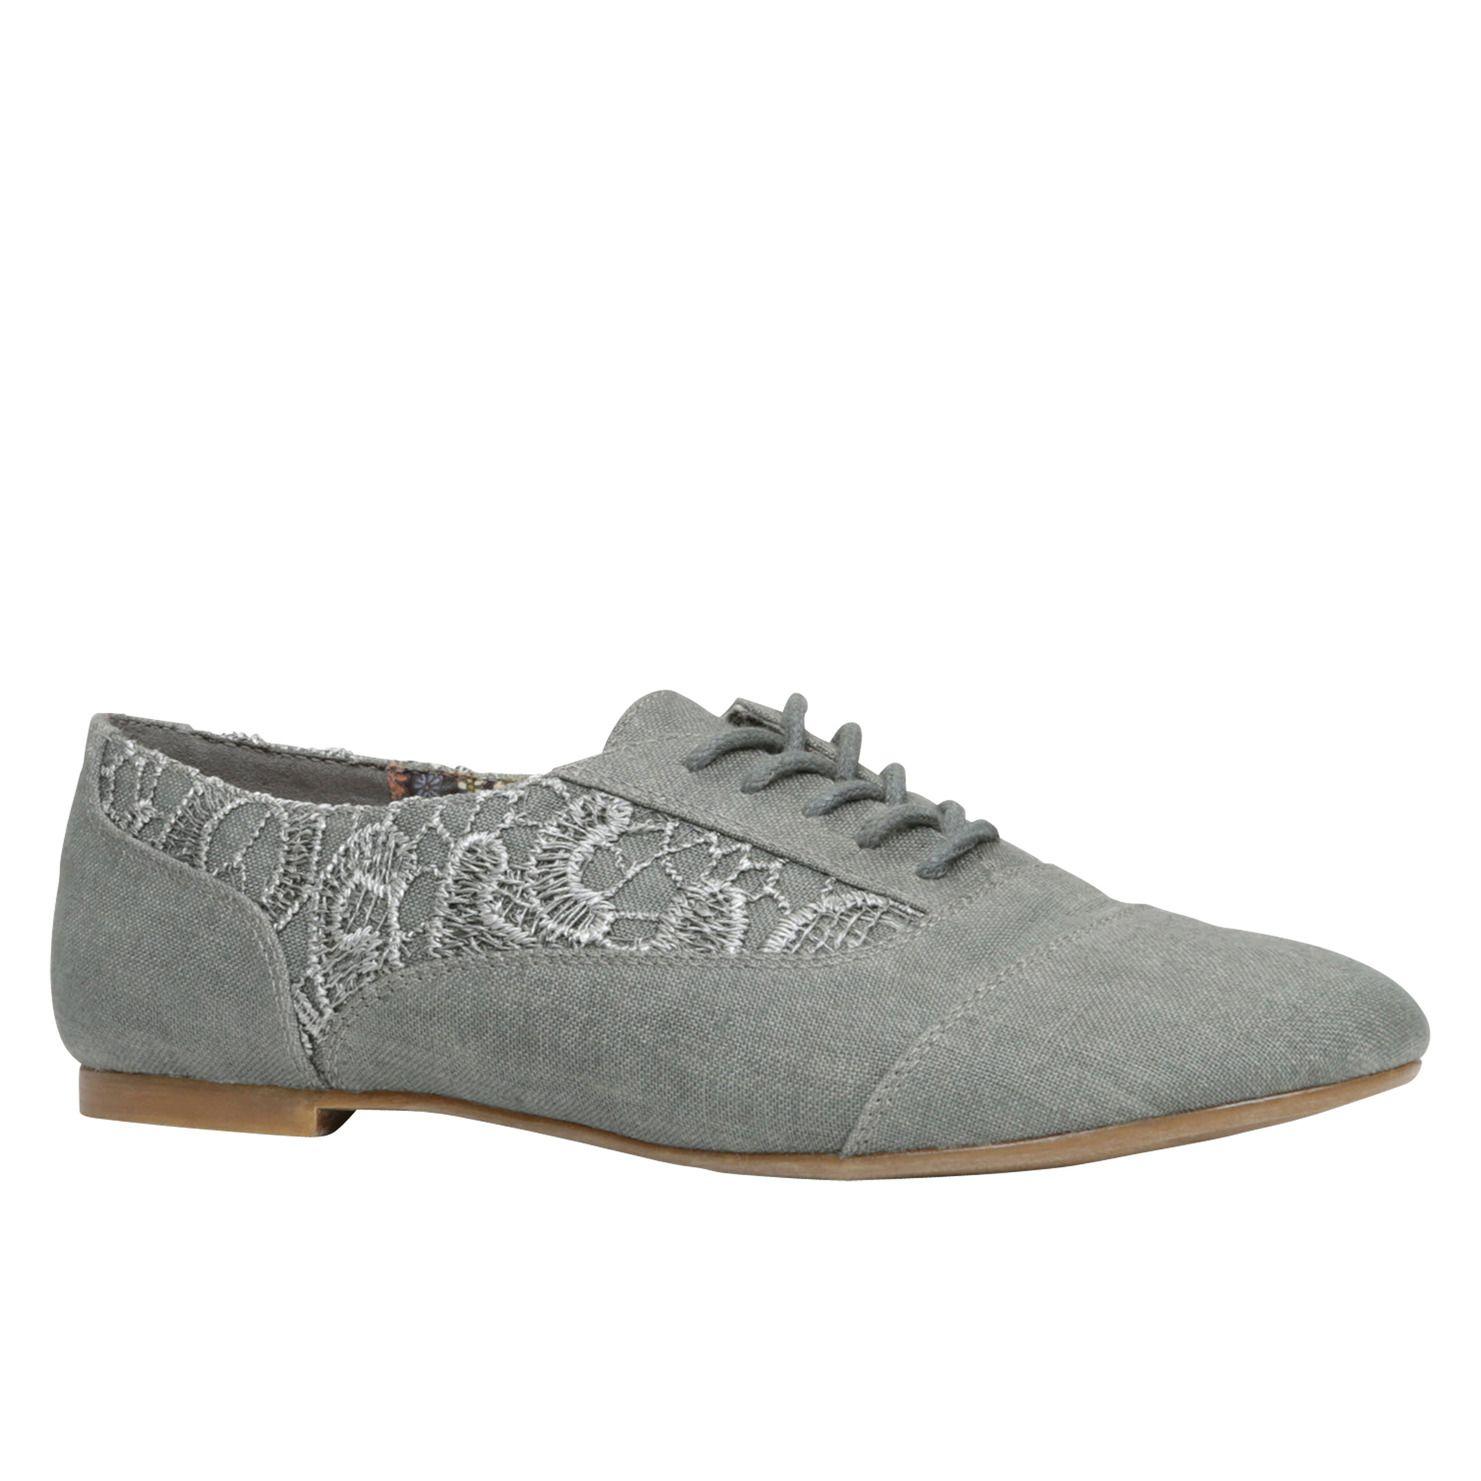 Buy ALIEDIA women's shoes flats at CALL